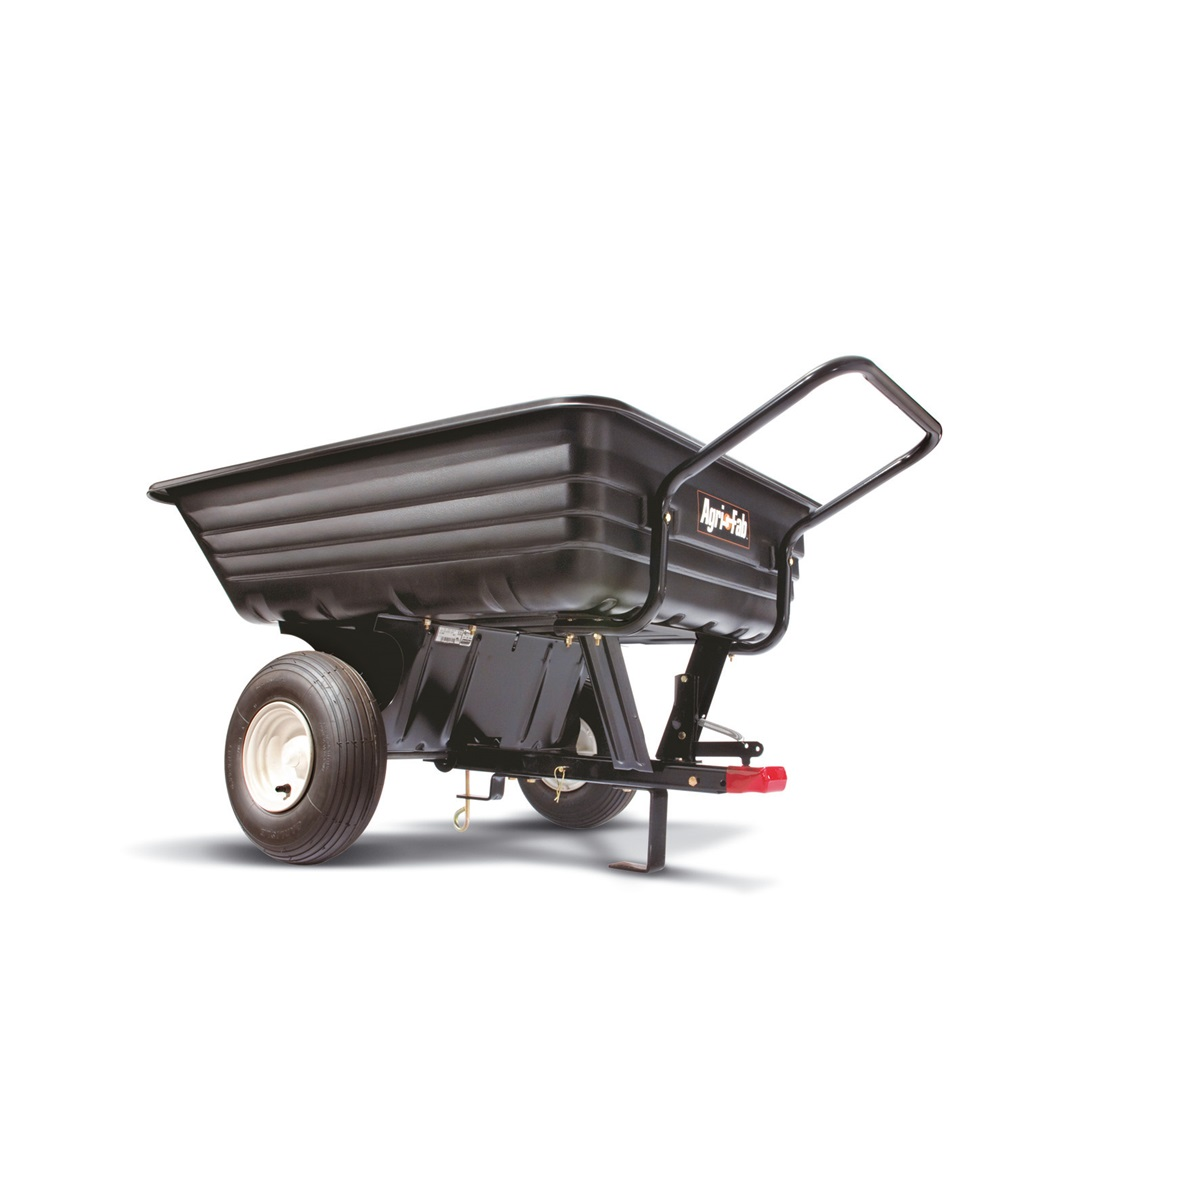 AgriFab AF 236, tažený/tlačný vozík s ložnou plochou z polyetylenu